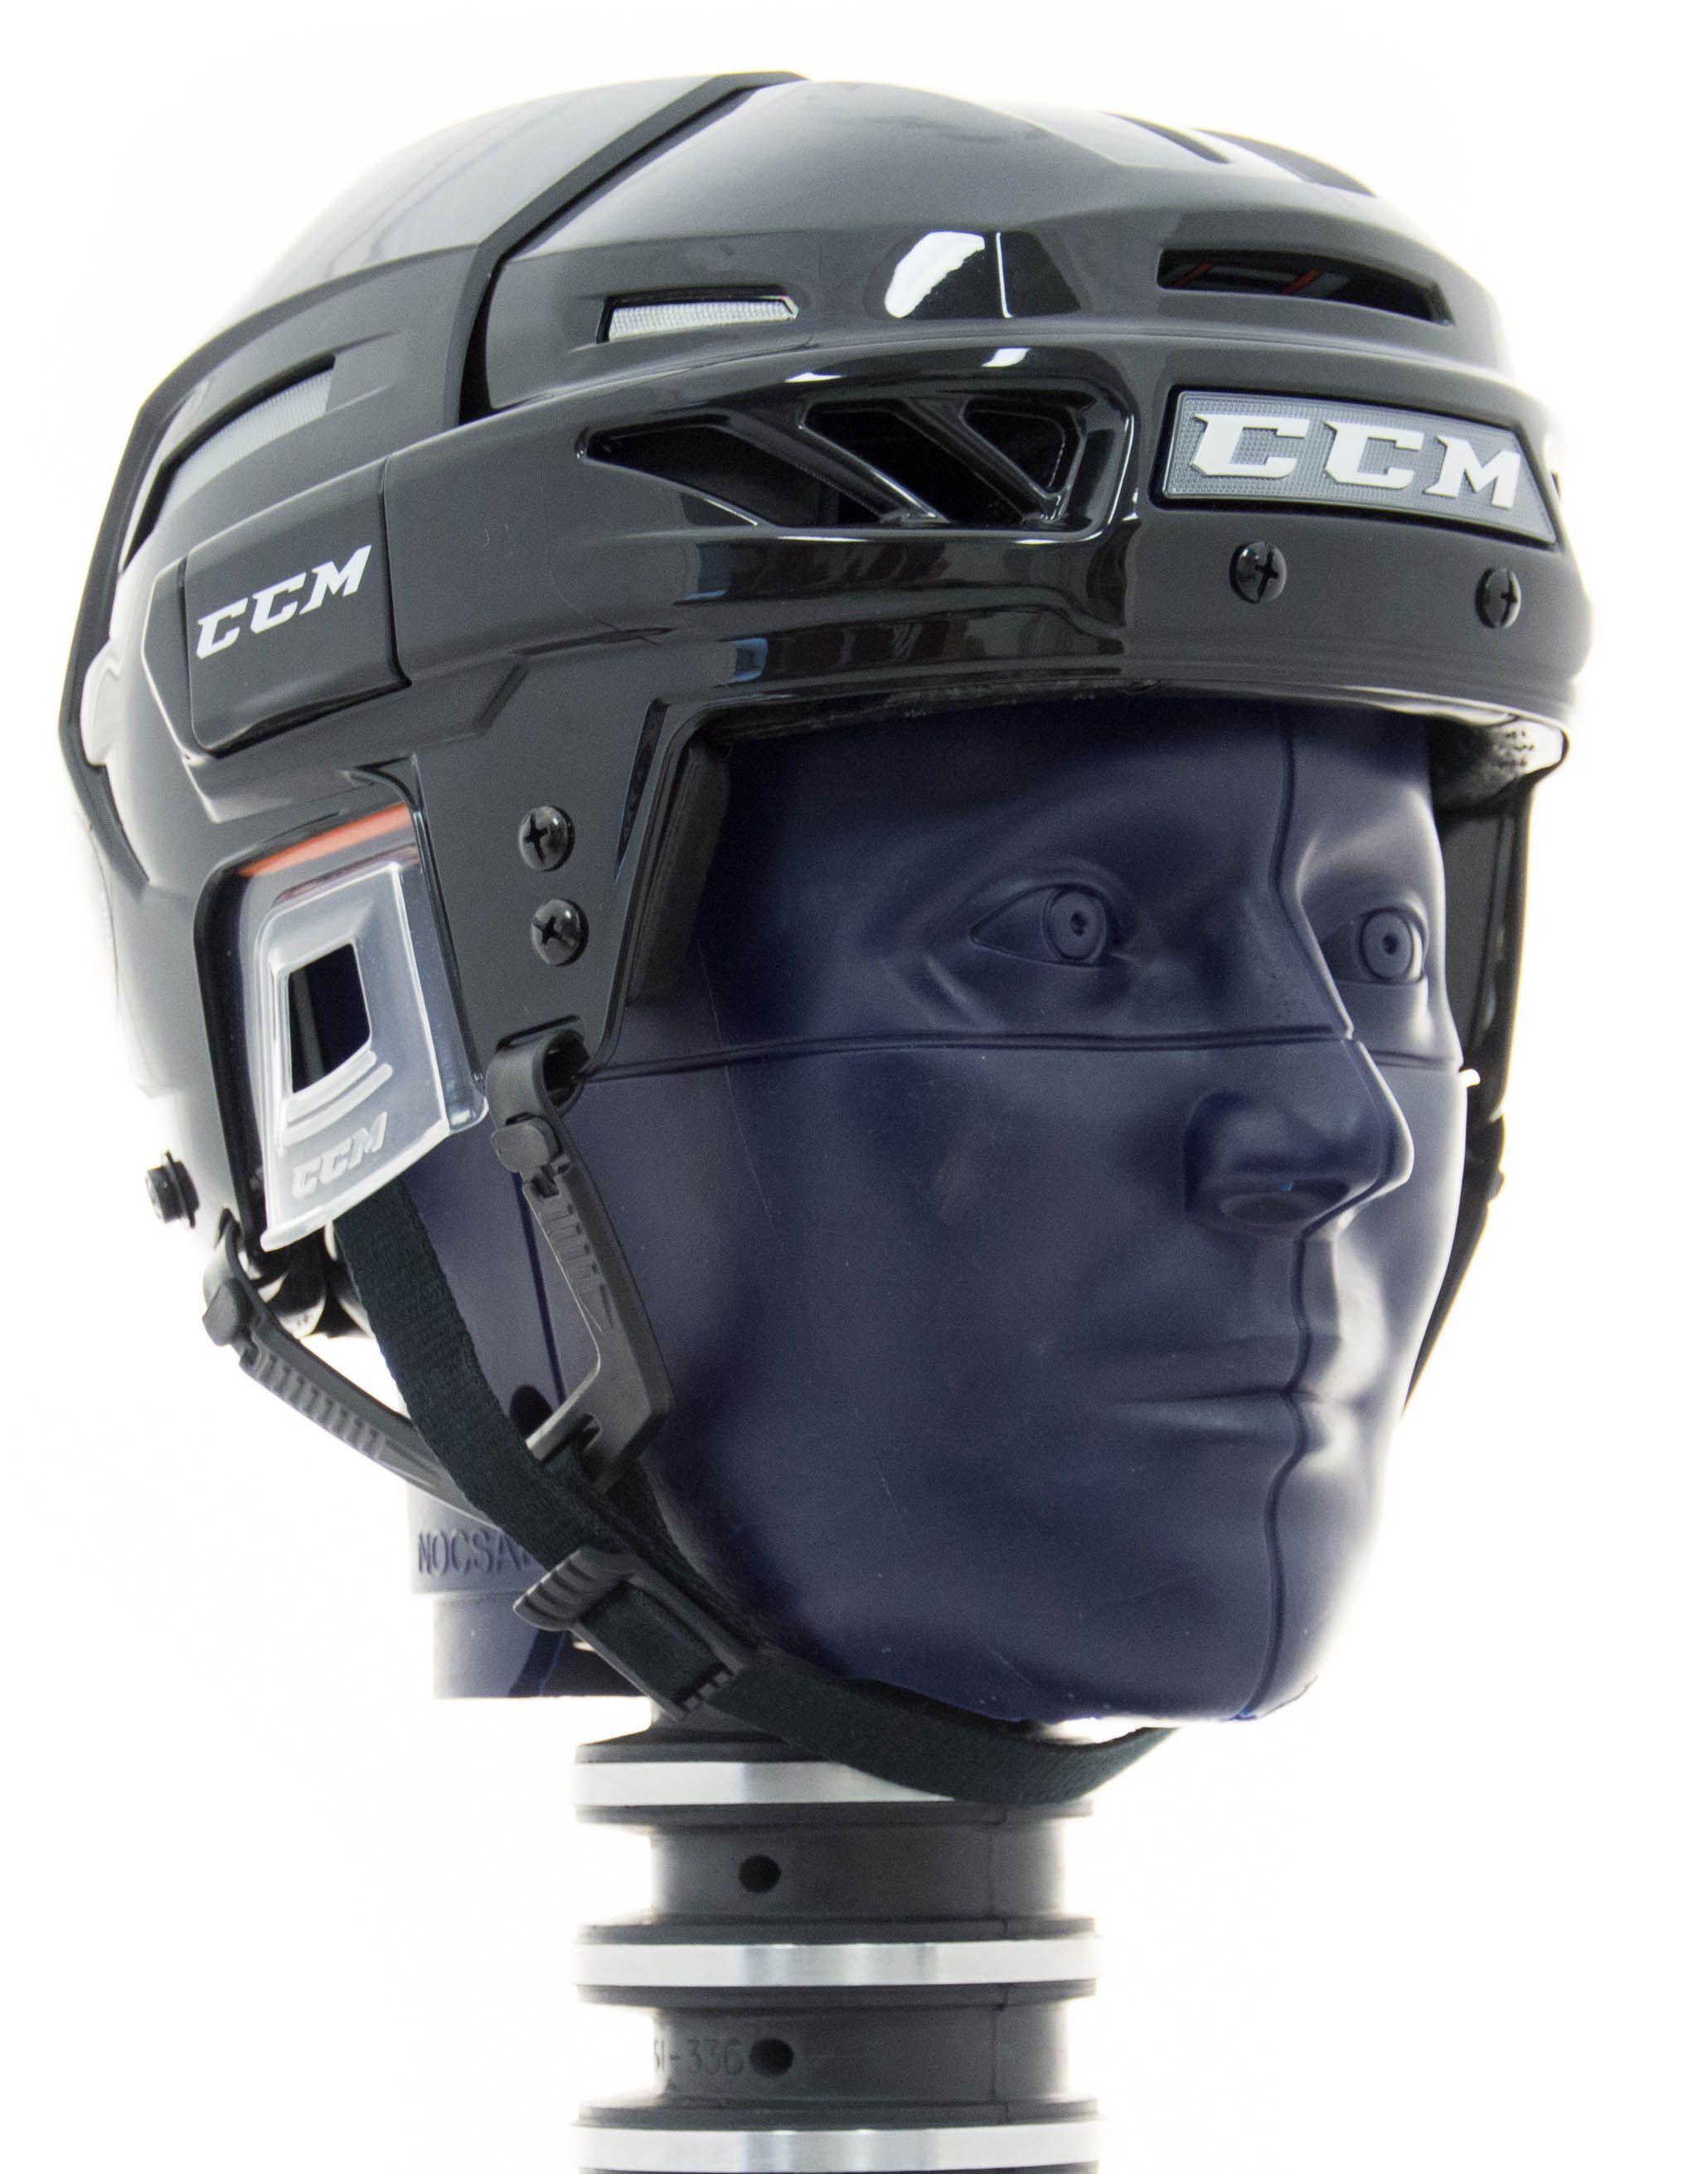 Virginia Tech Hockey Helmet Ratings (With images) Hockey